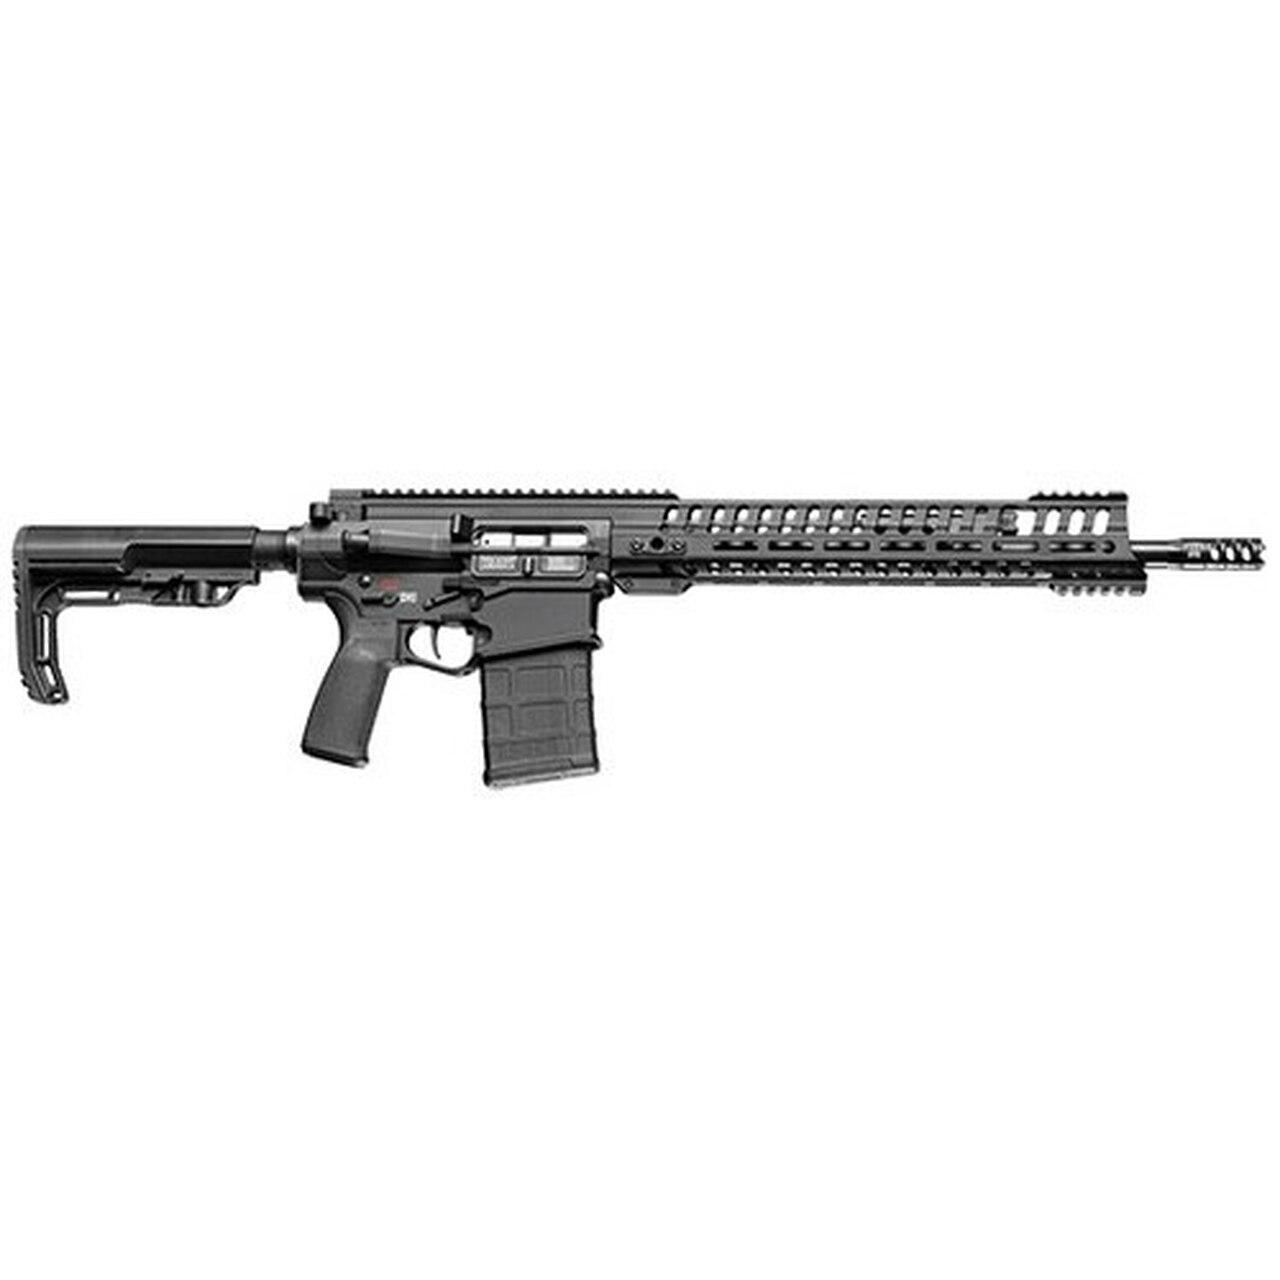 "Image of POF P308 Edge Rifle 308 Win, 16.5"" Barrel, 5 Pos Piston Gas Block, 14.5"" M-Lok Edge Rail, Black, MagPul 20rd"